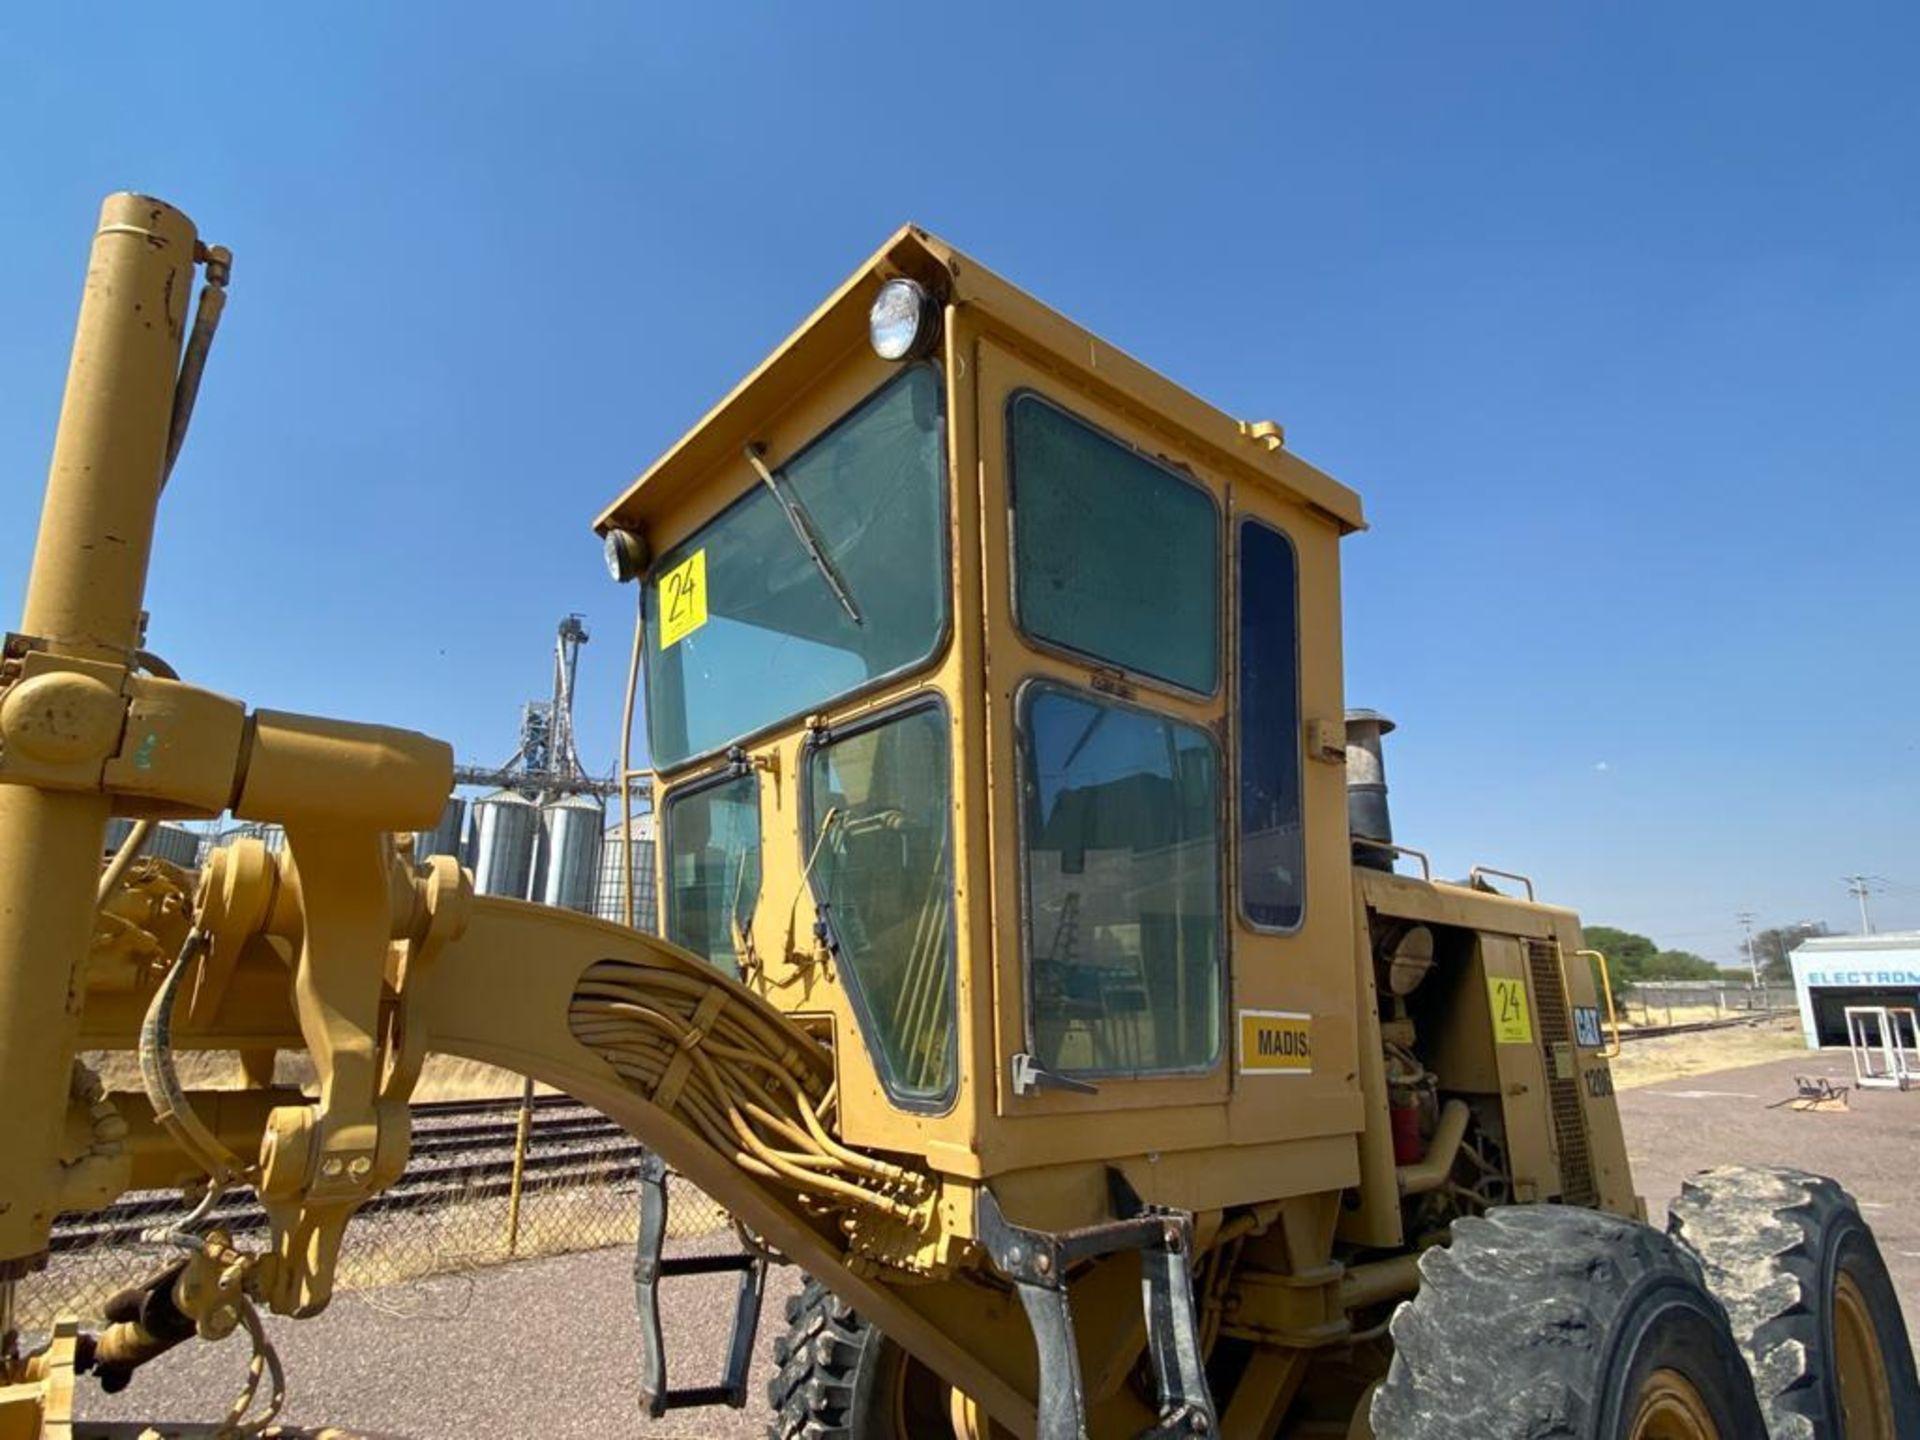 Caterpillar 120G Motor Grader, Serial number 87V09646, Motor number PQ883-2/07Z28983 - Image 32 of 61